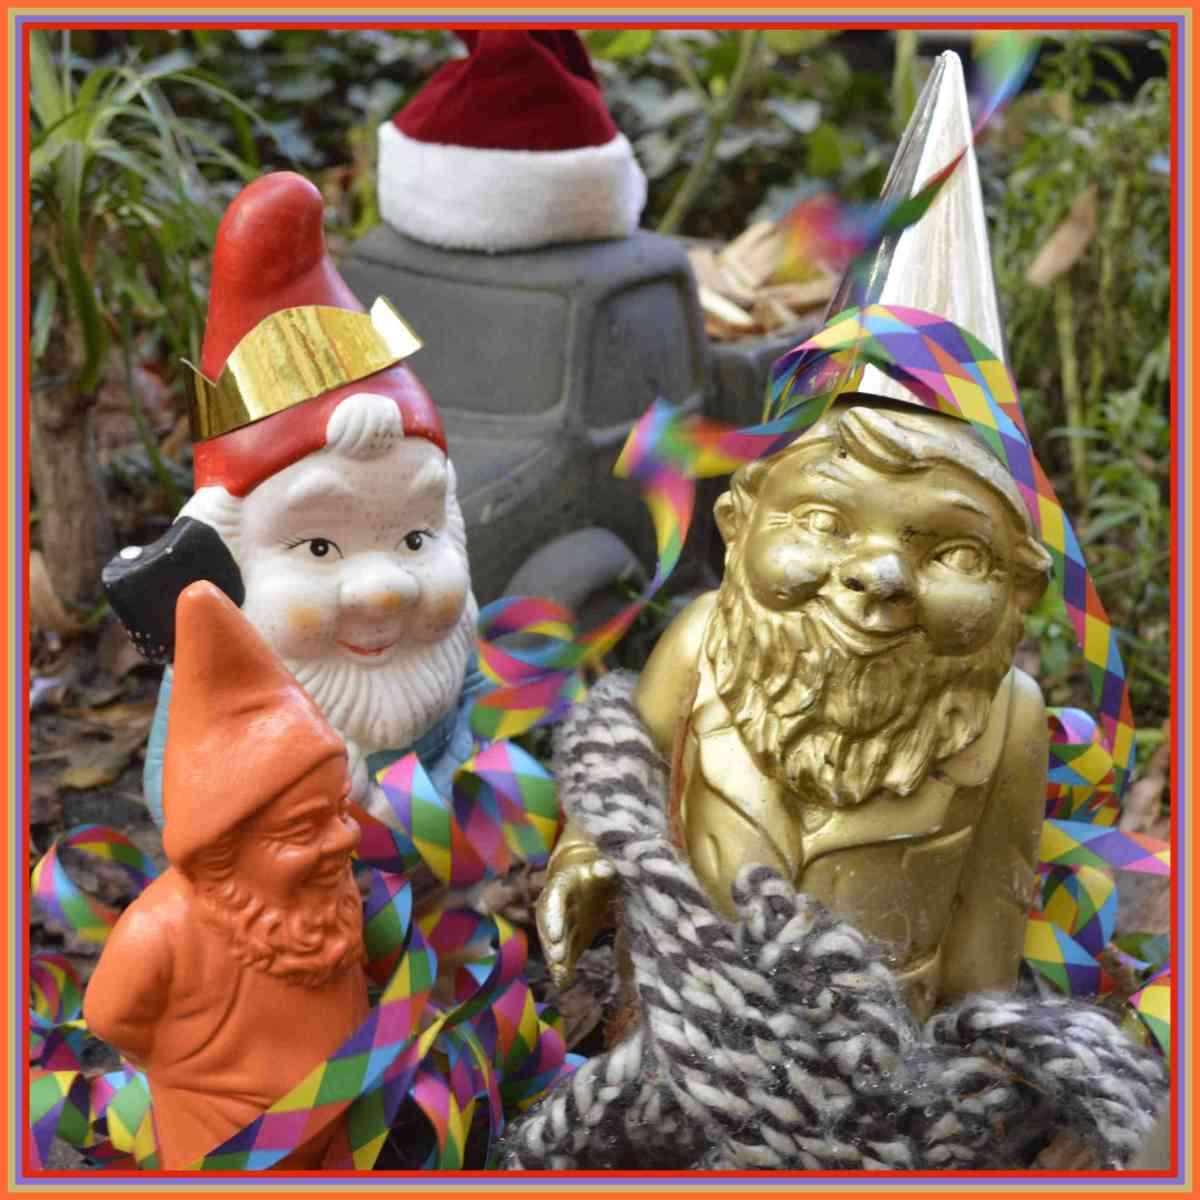 Happy Gnome Year